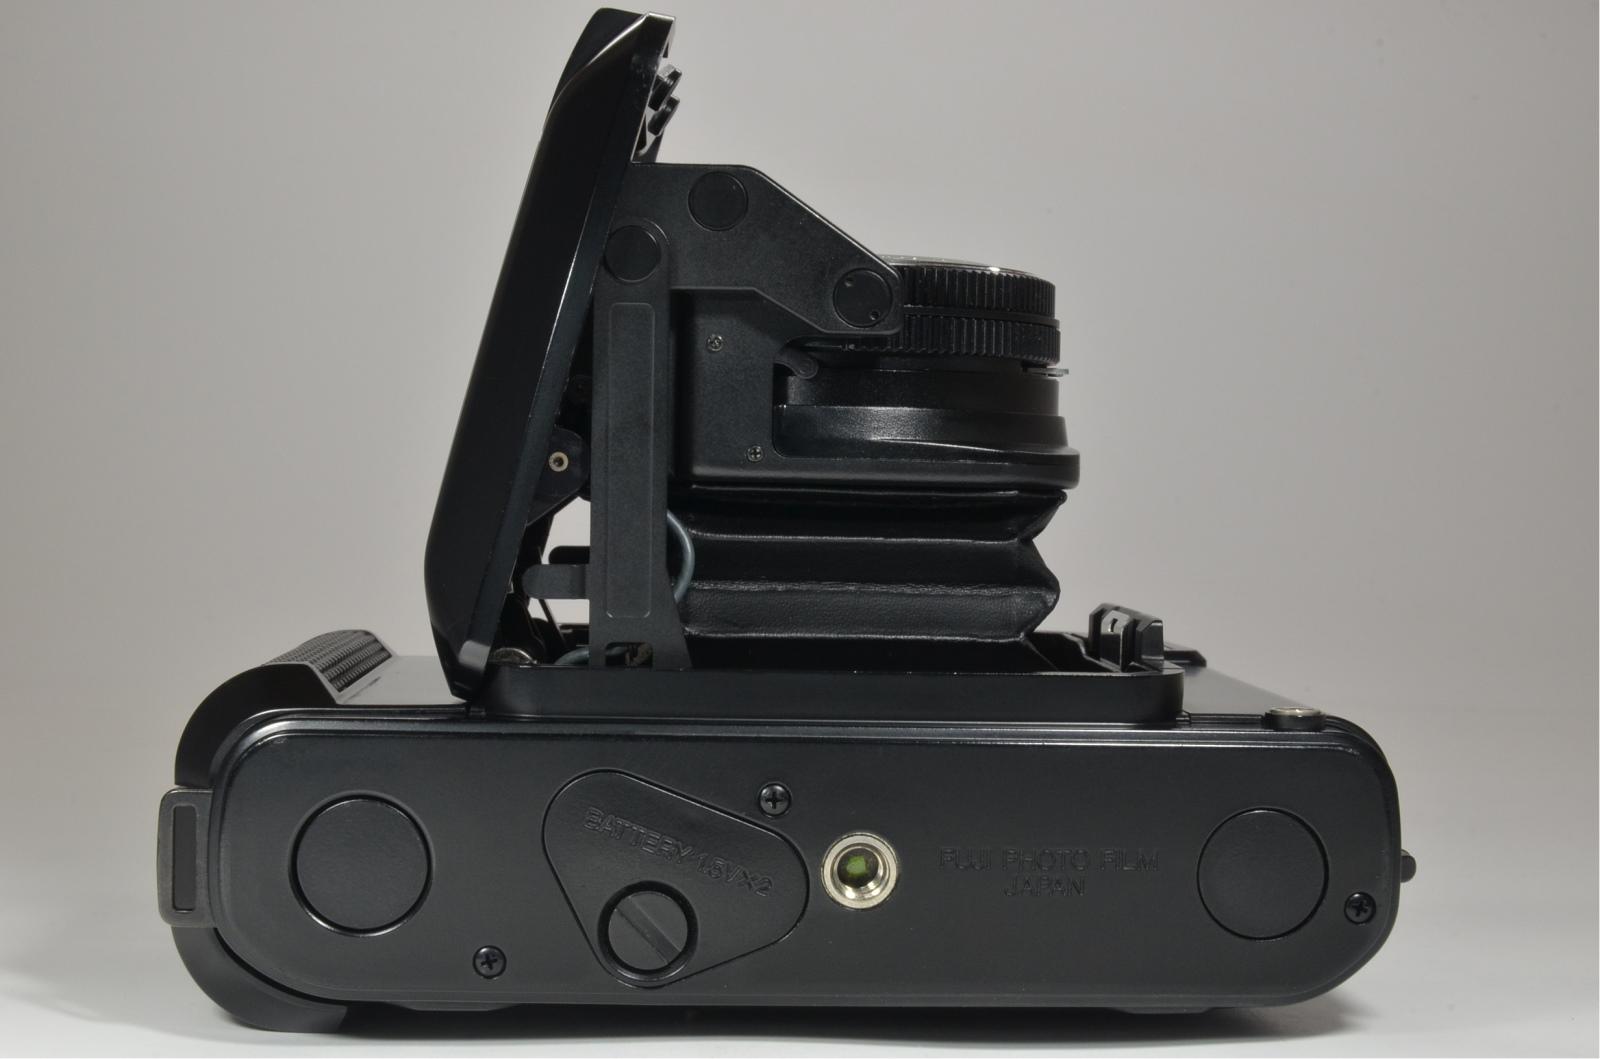 fujifilm fujica gs645 film camera 75mm f3.4 w/ lens filter and hood